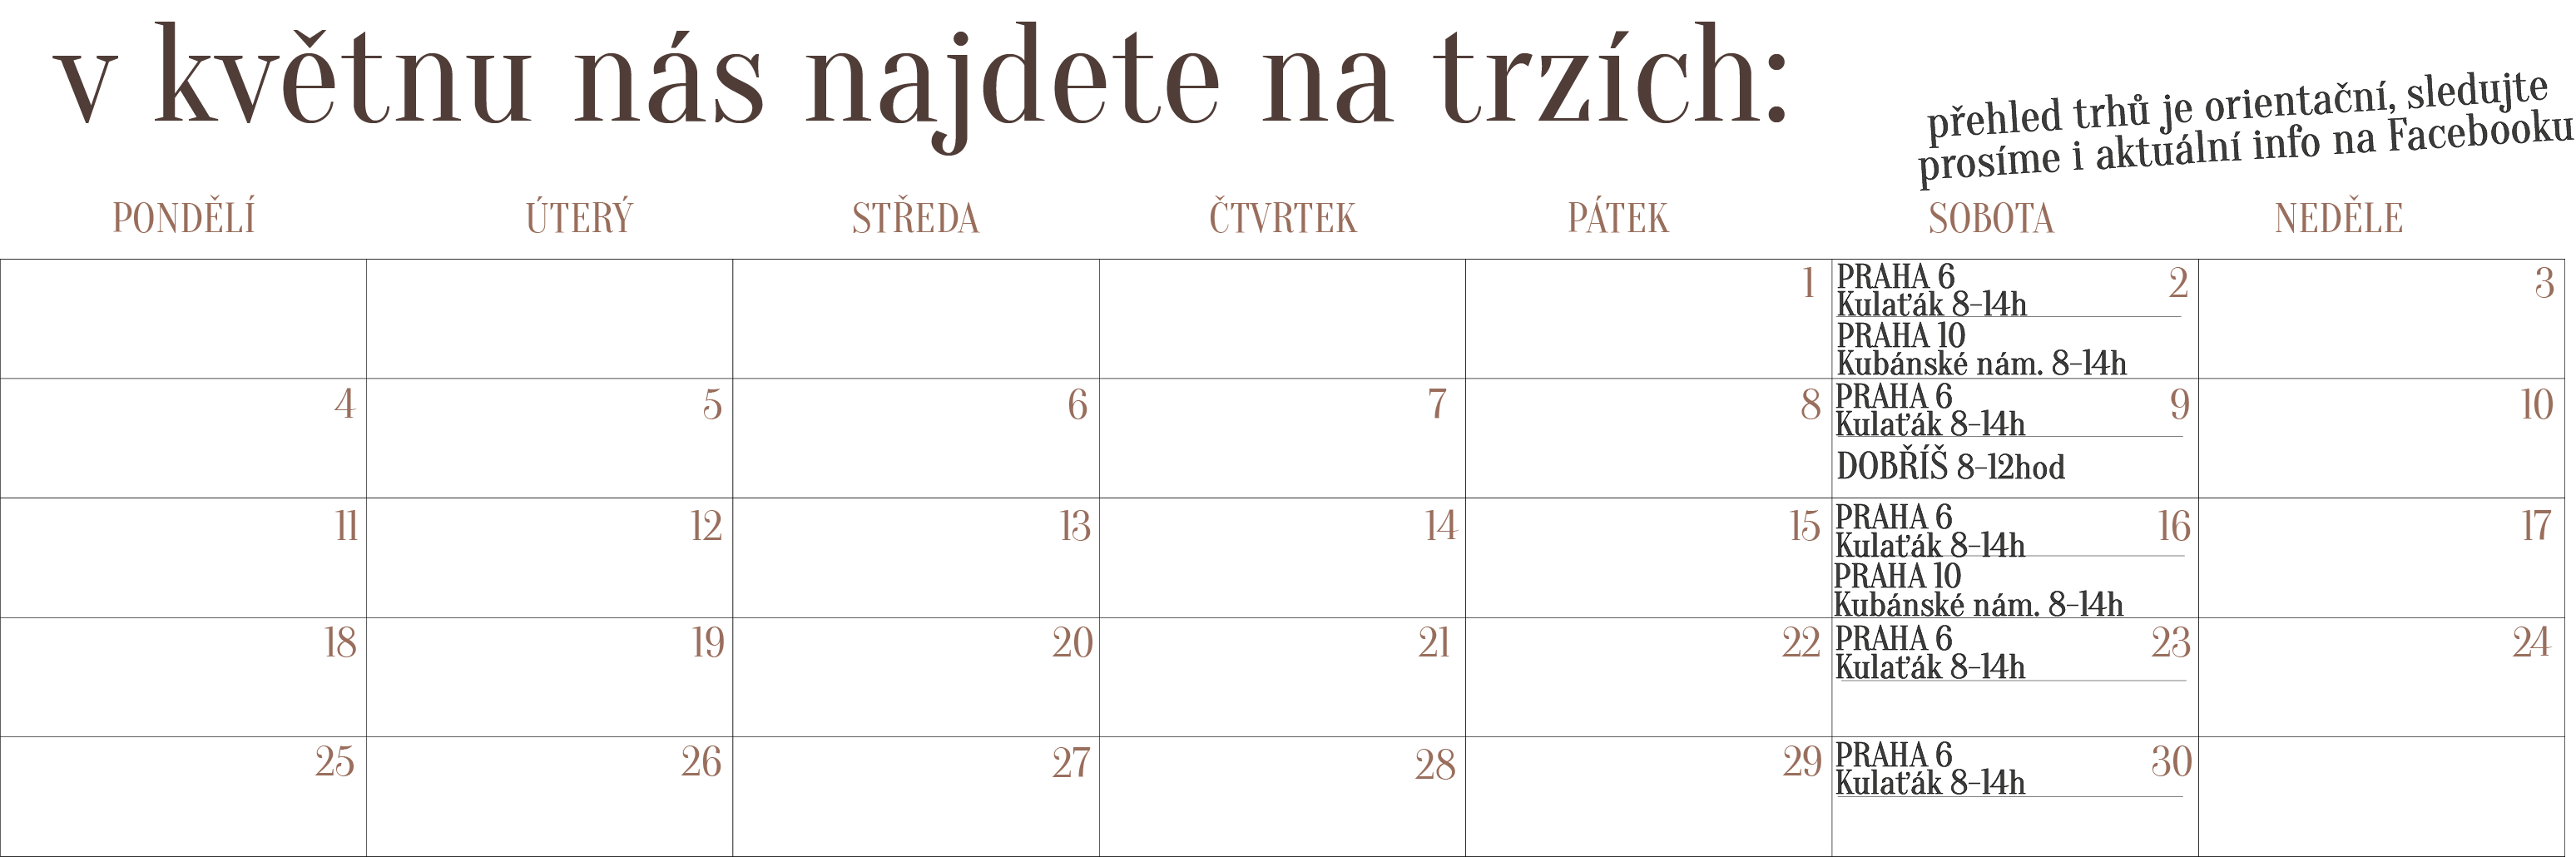 kveten 2020_2.png